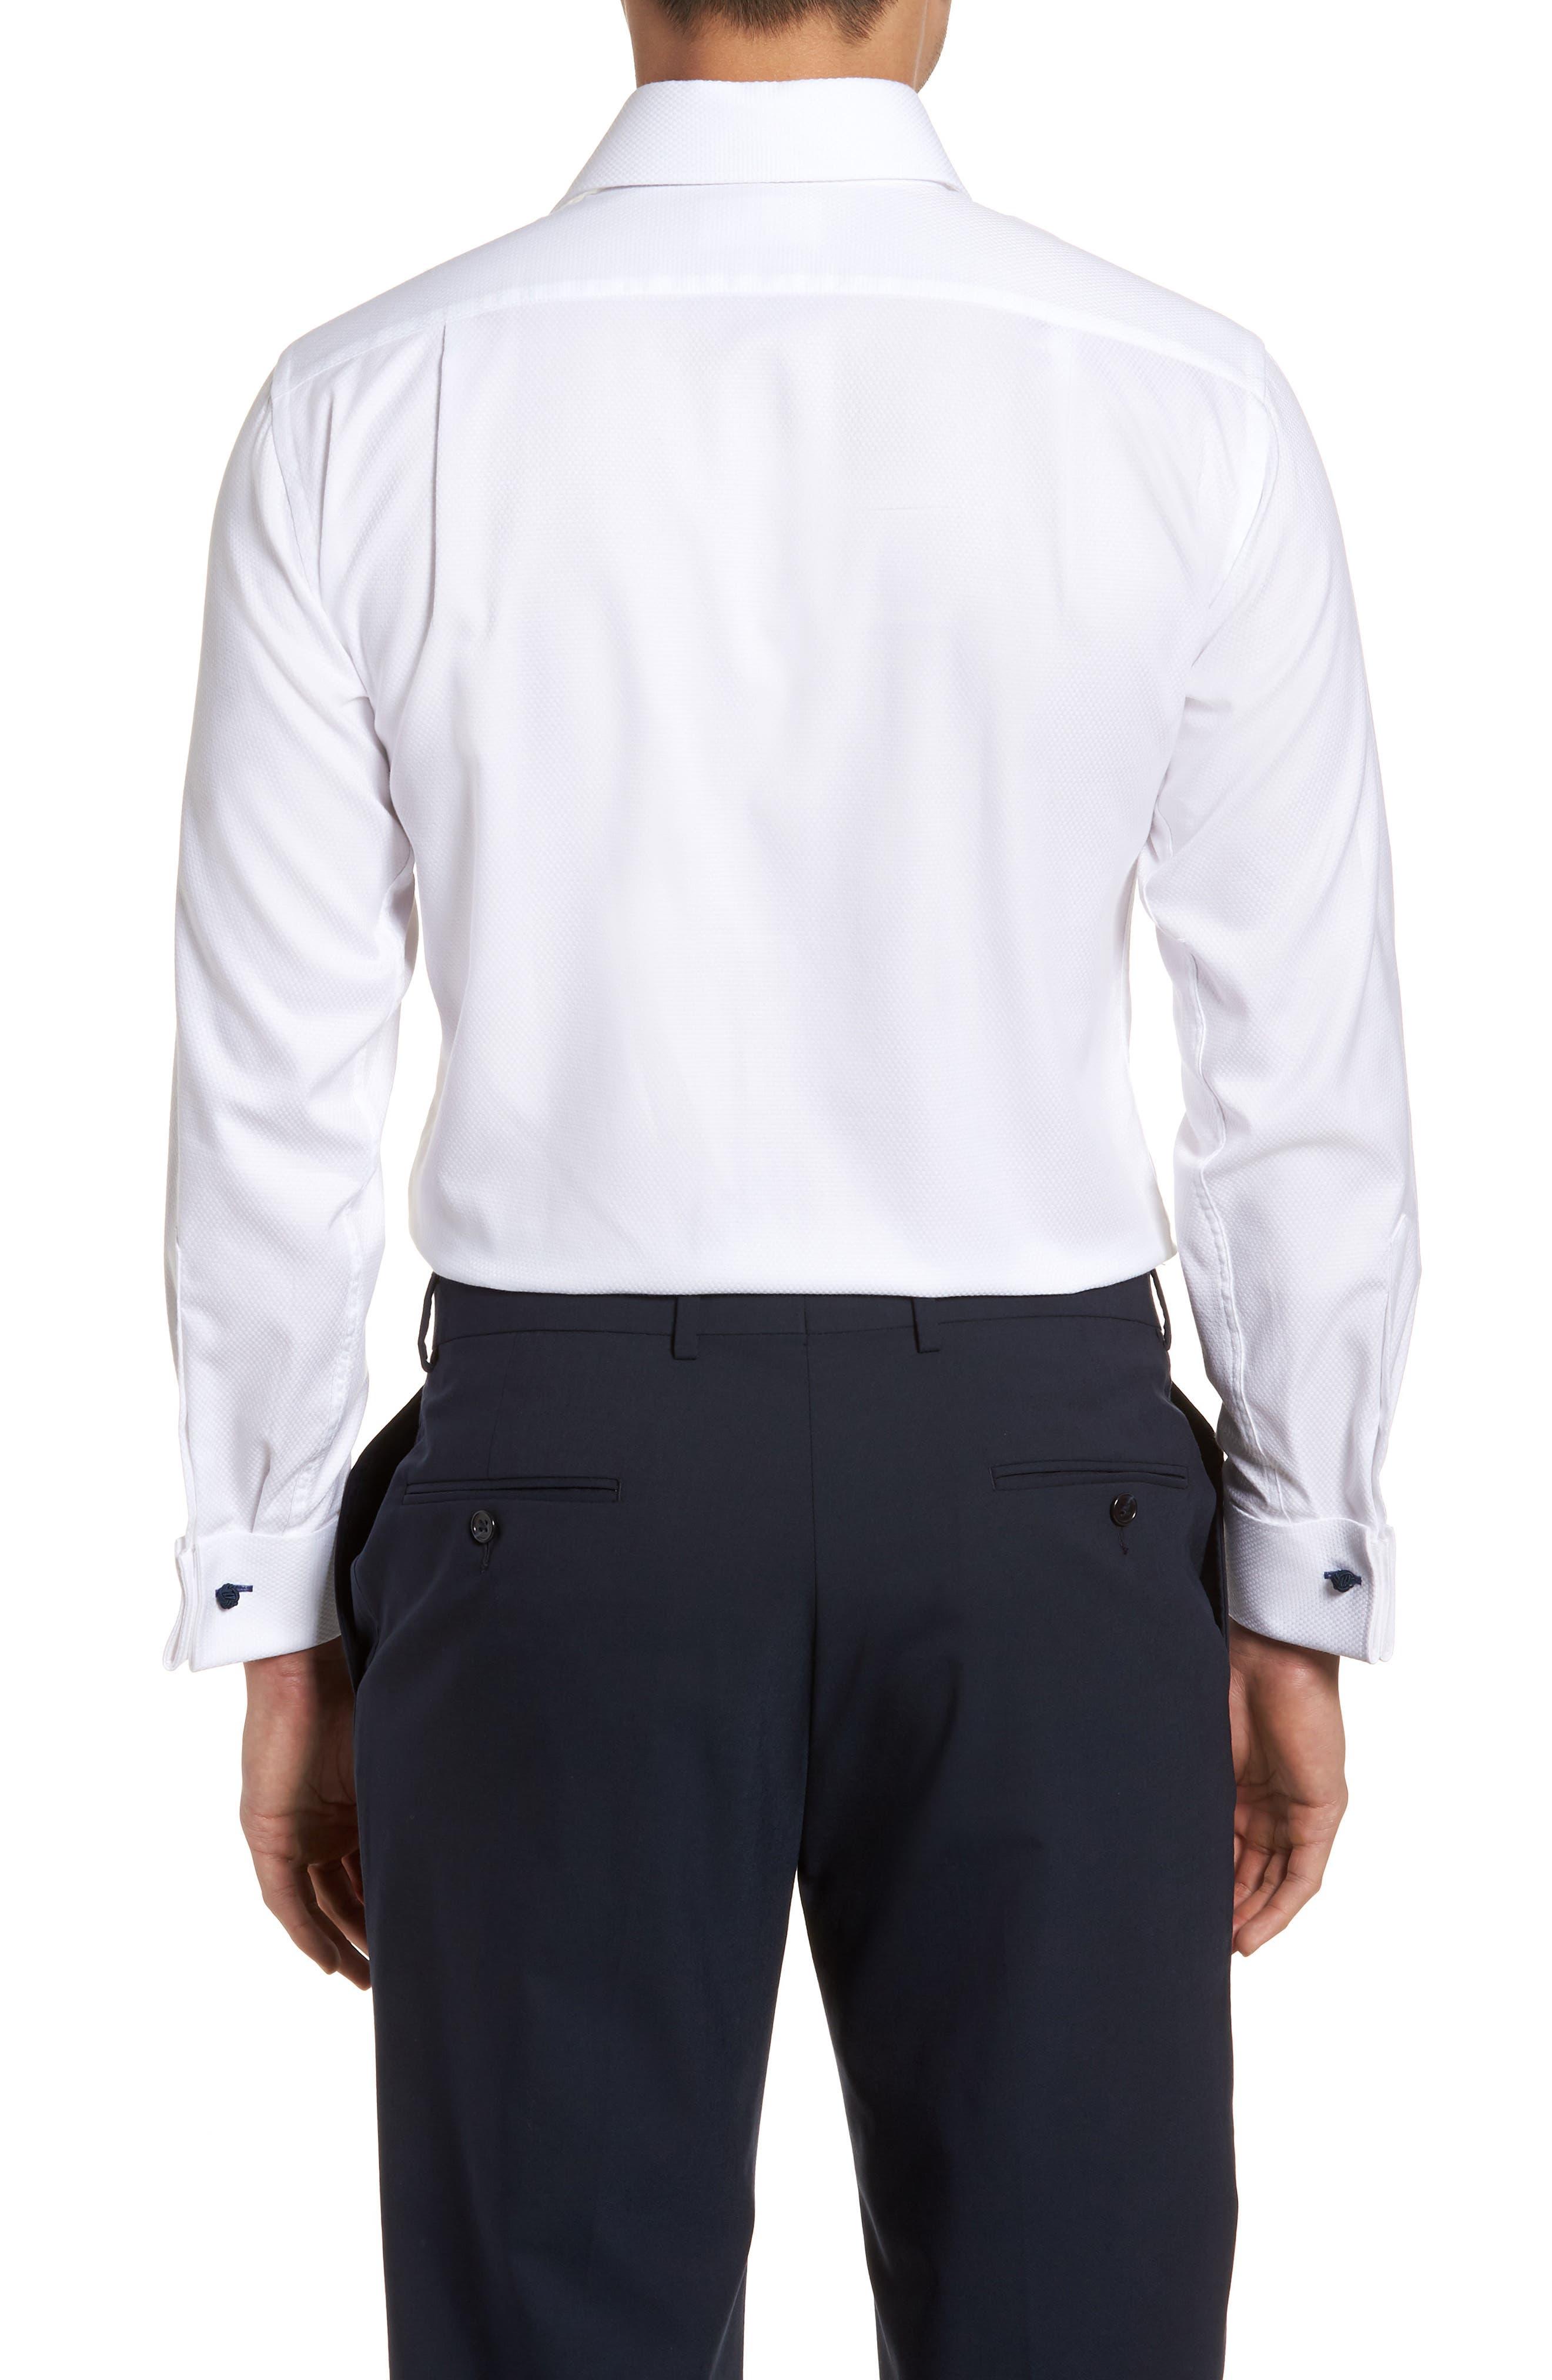 LORENZO UOMO, Trim Fit Basket Weave Dress Shirt, Alternate thumbnail 3, color, WHITE